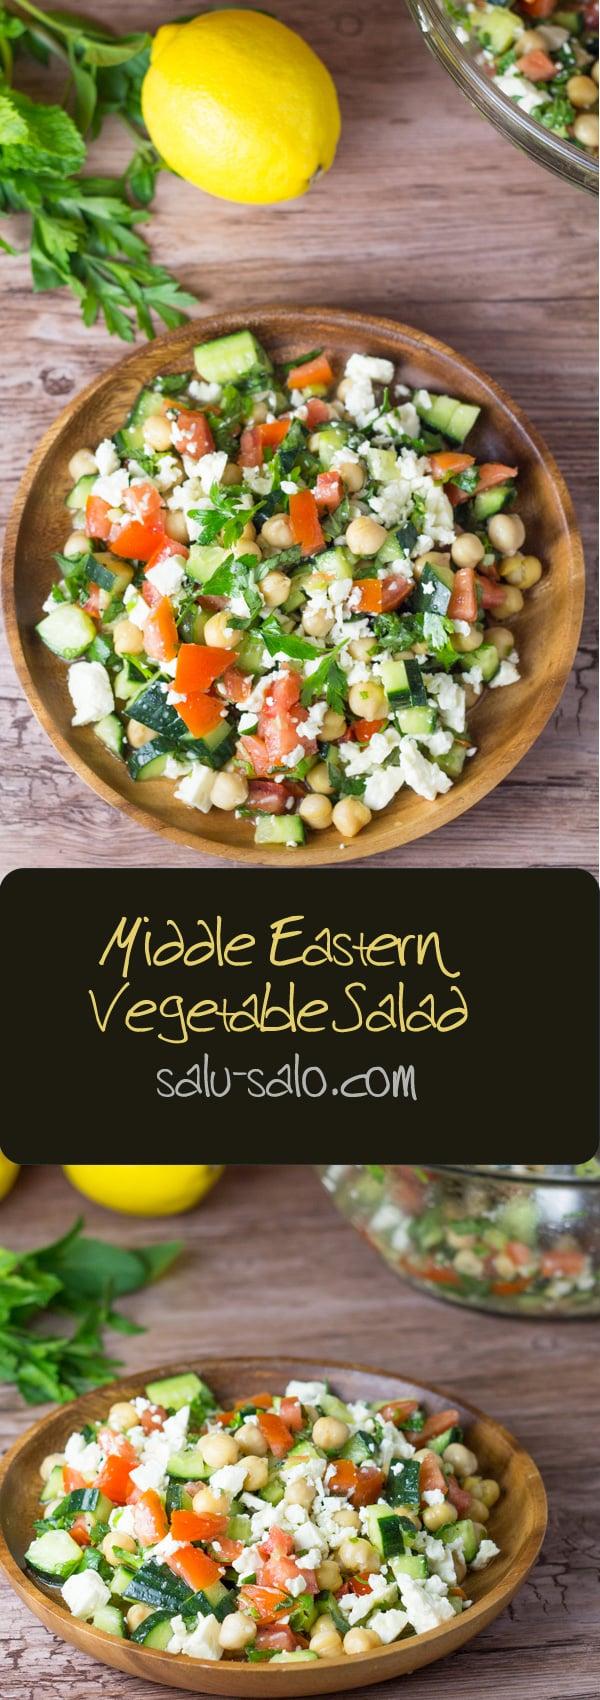 Middle Eastern Vegetable Salad